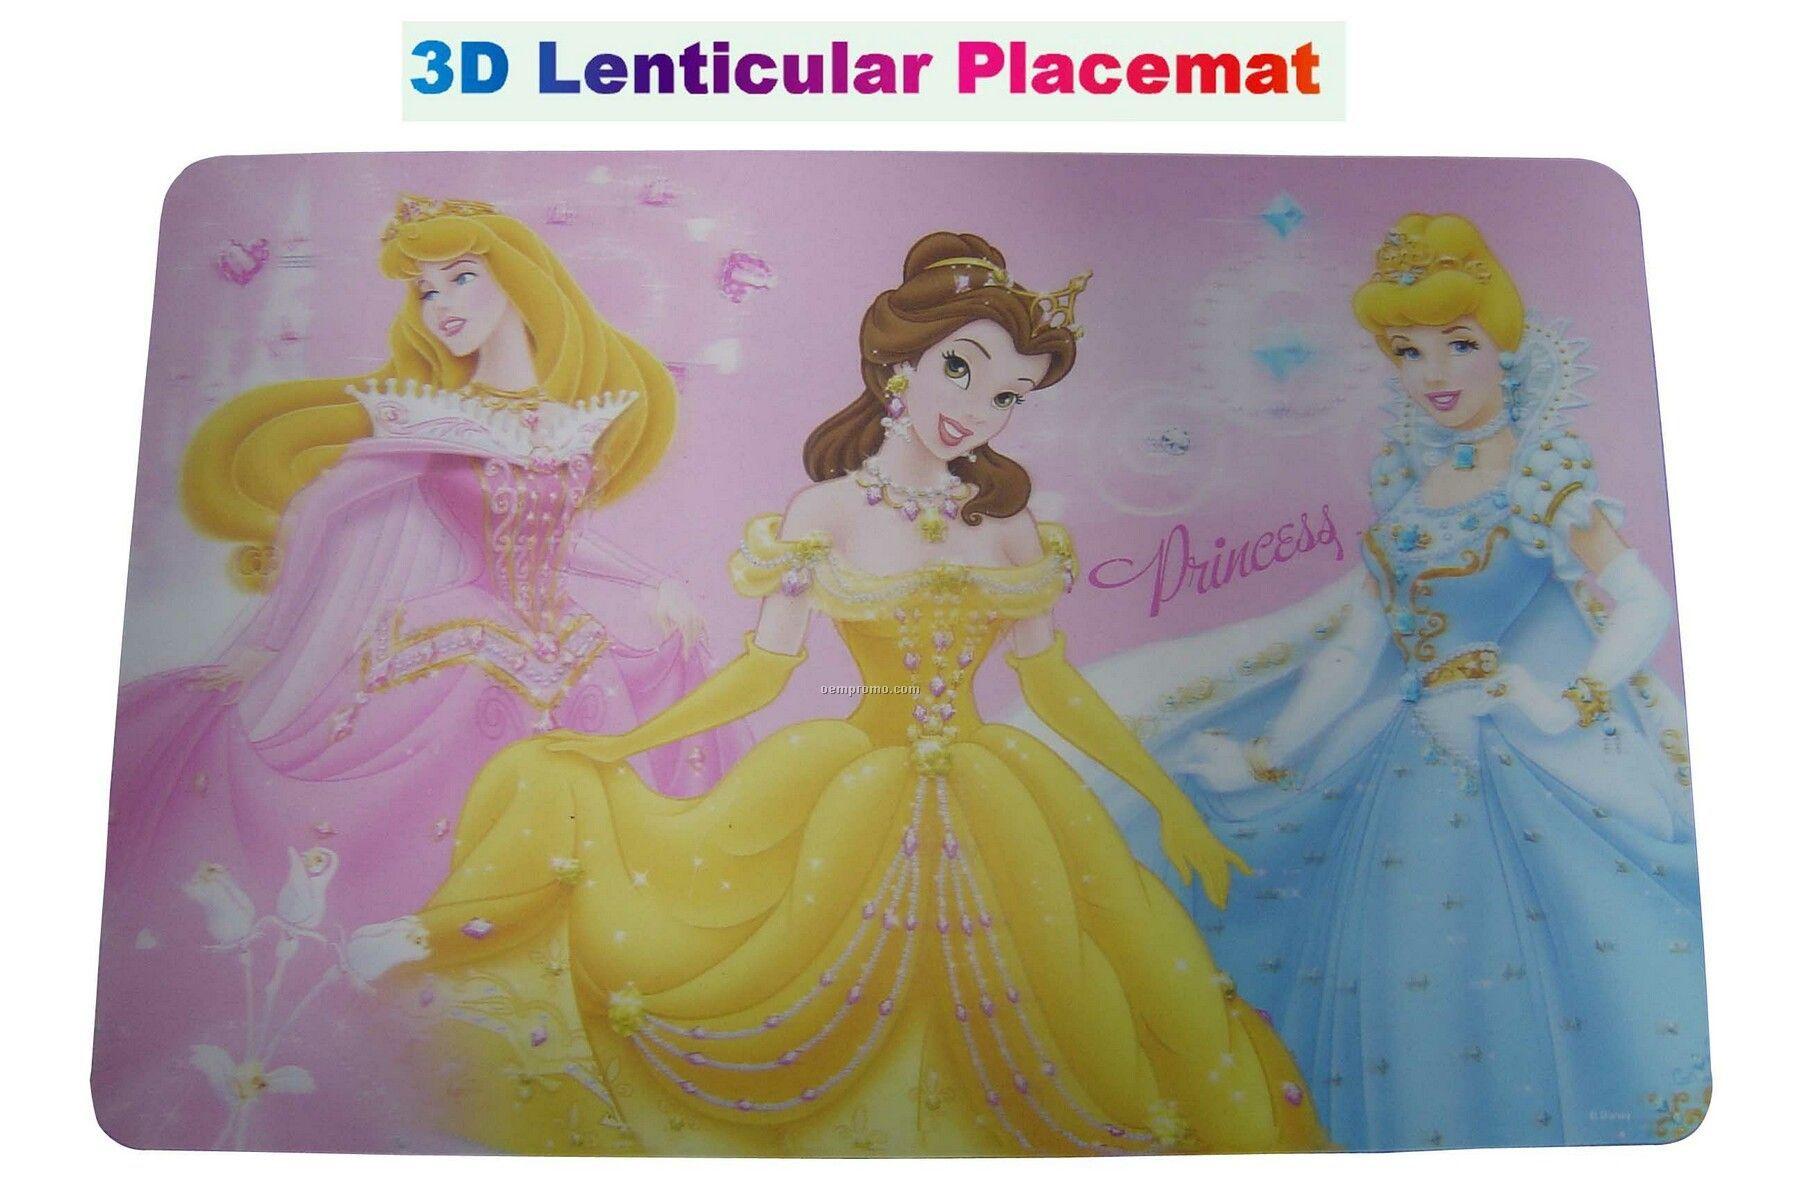 3d Lenticular Placemat